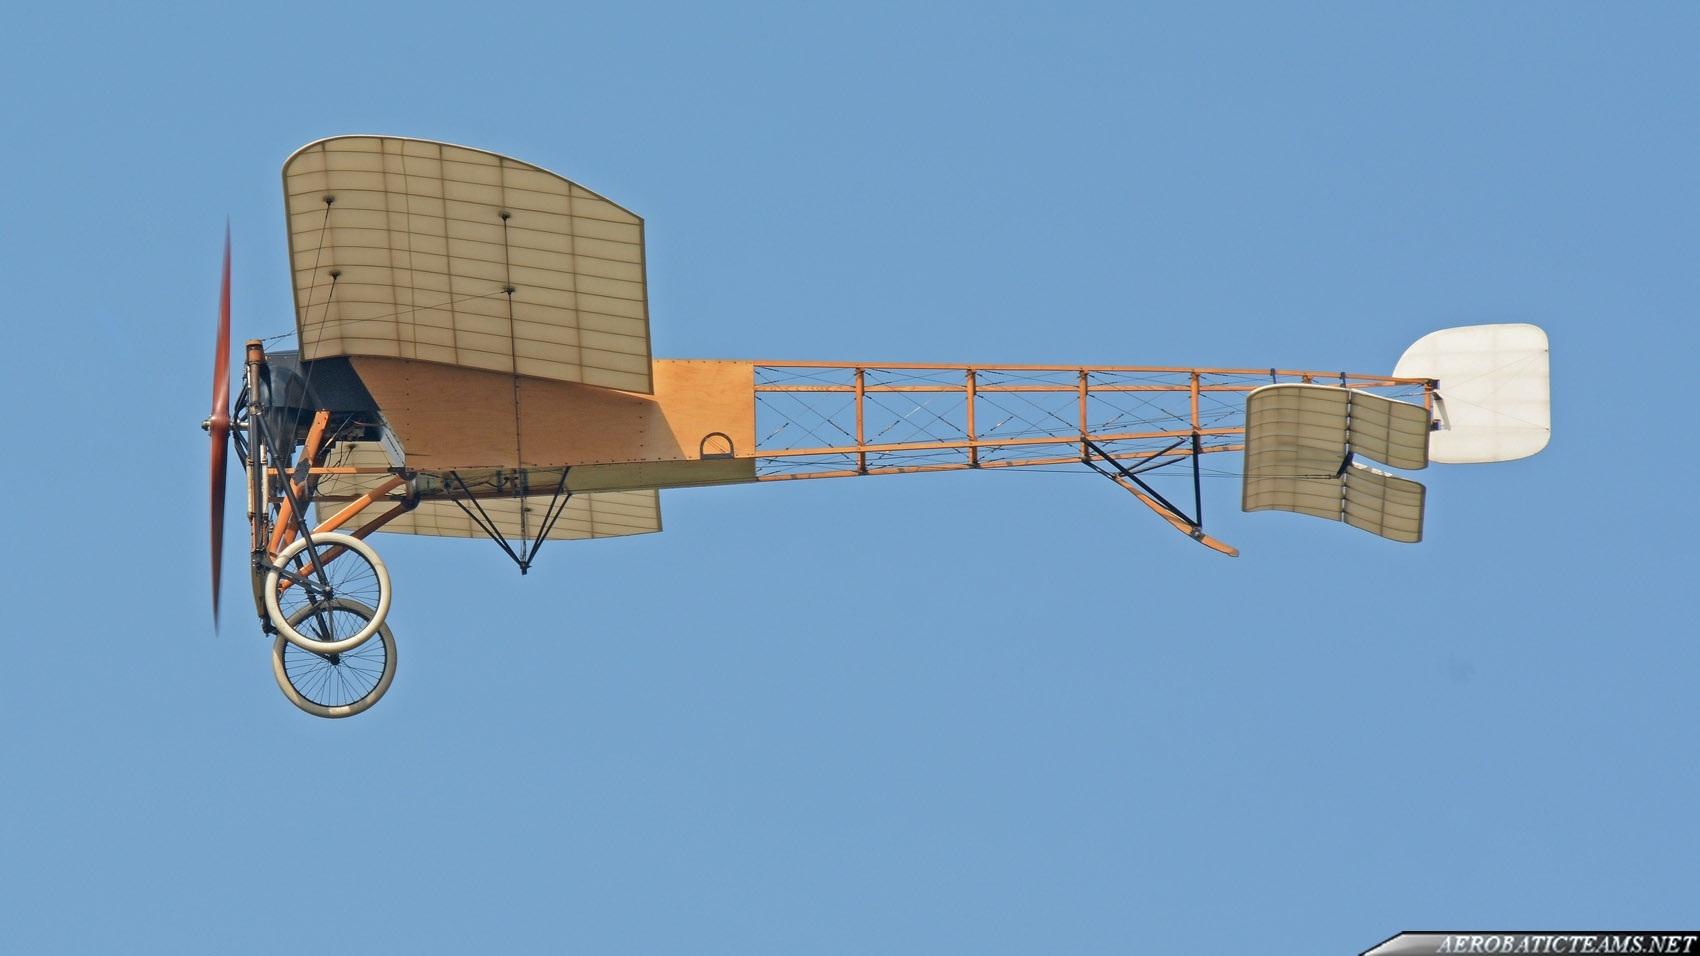 Bleriot XI Replica